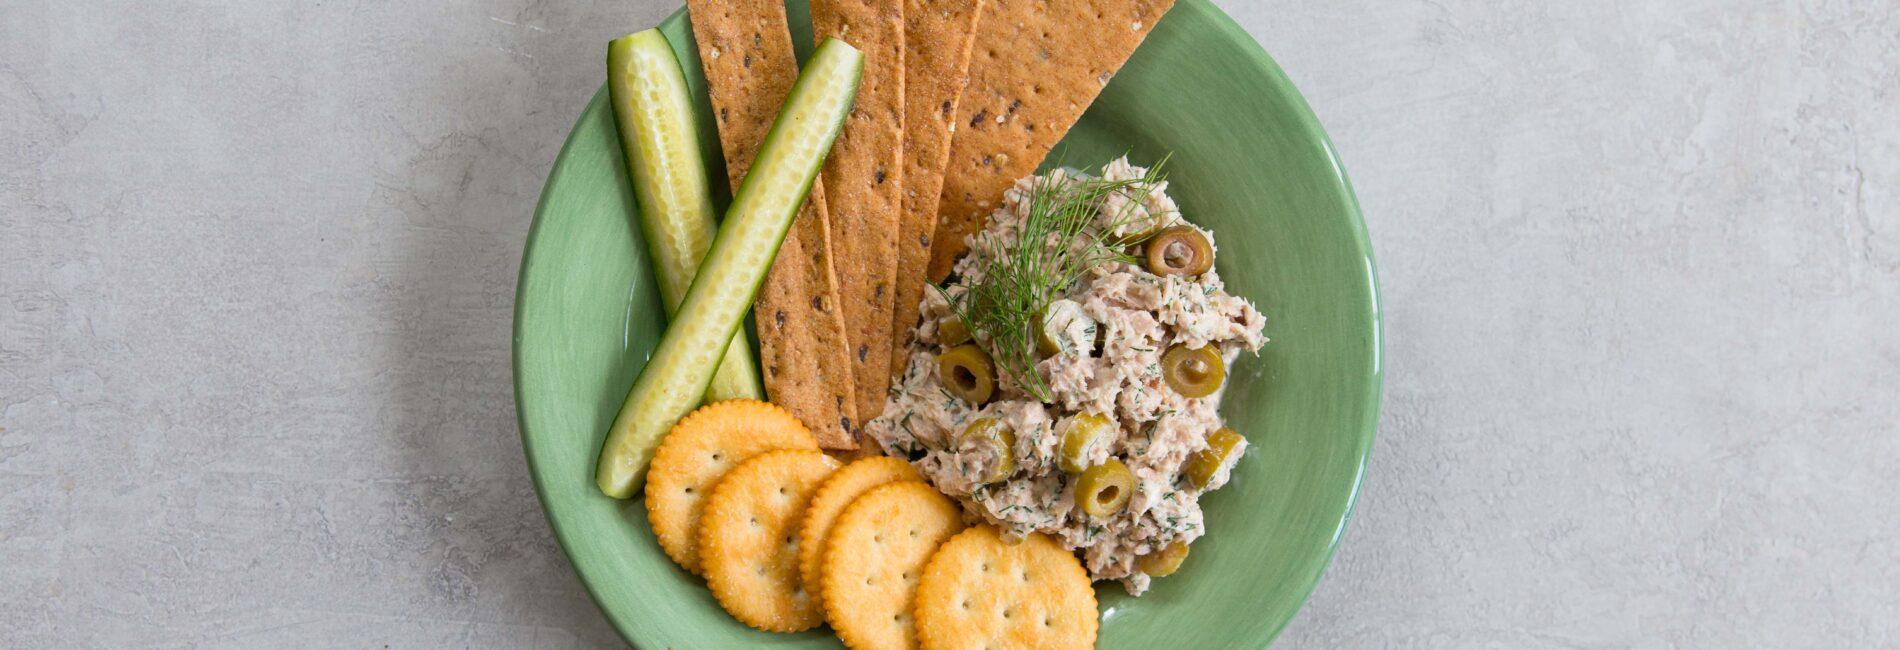 Easy and Quick Olive Tuna Salad